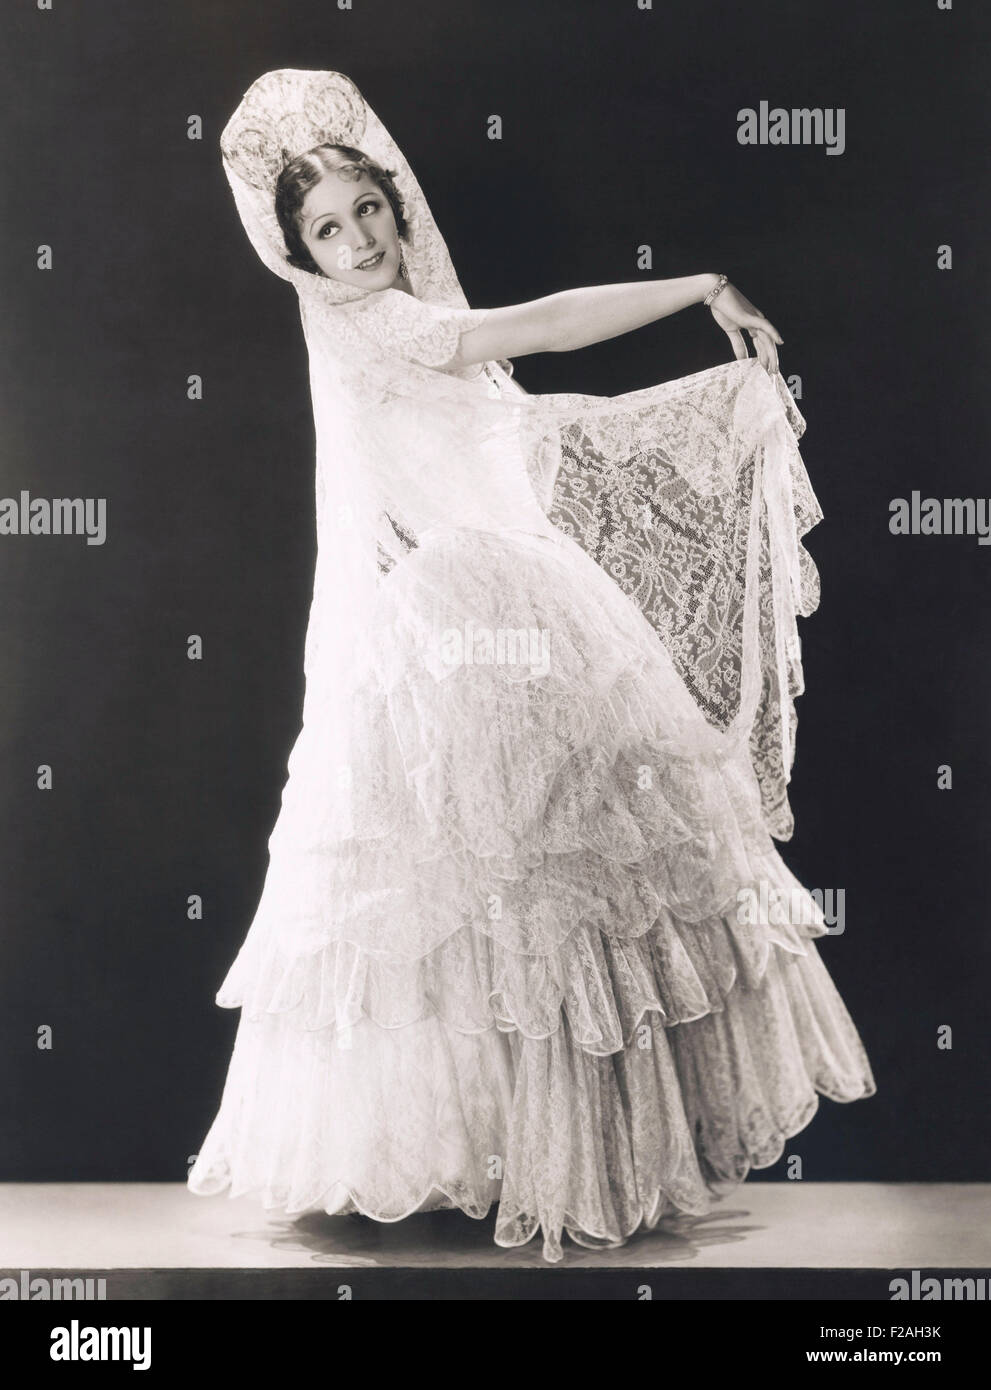 Veil Woman Lace Stockfotos & Veil Woman Lace Bilder - Alamy